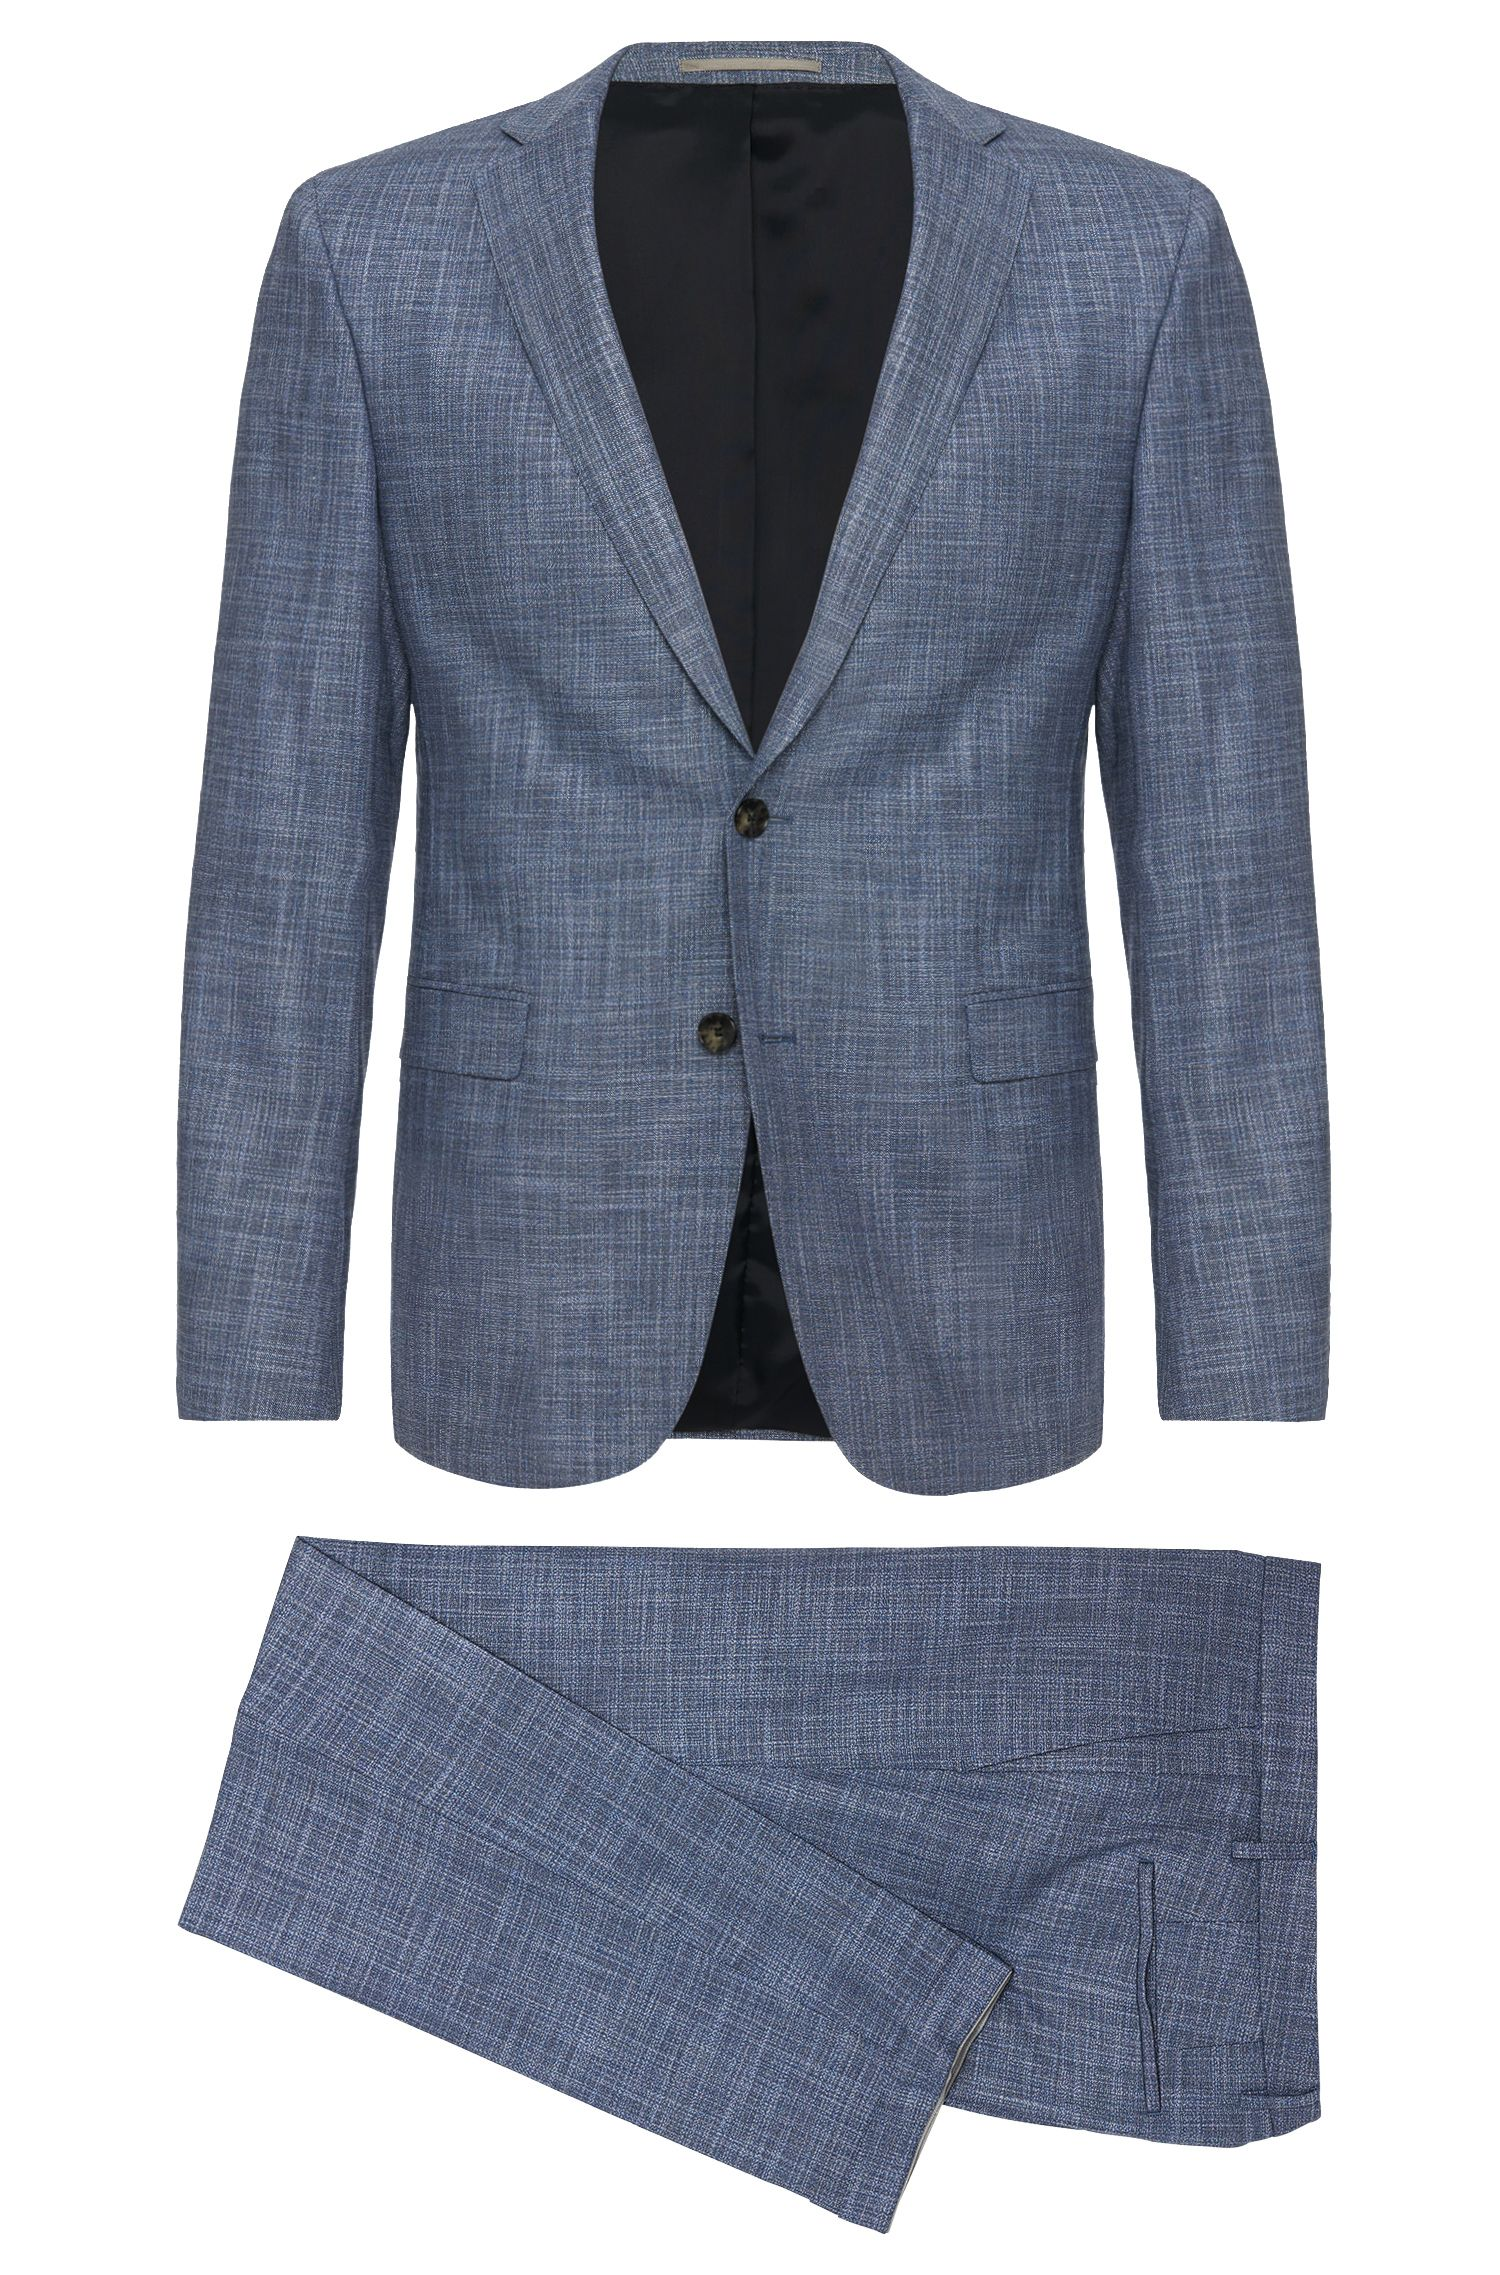 'Reyno/Wave' | Extra Slim Fit, Stretch Virgin Wool Blend Suit